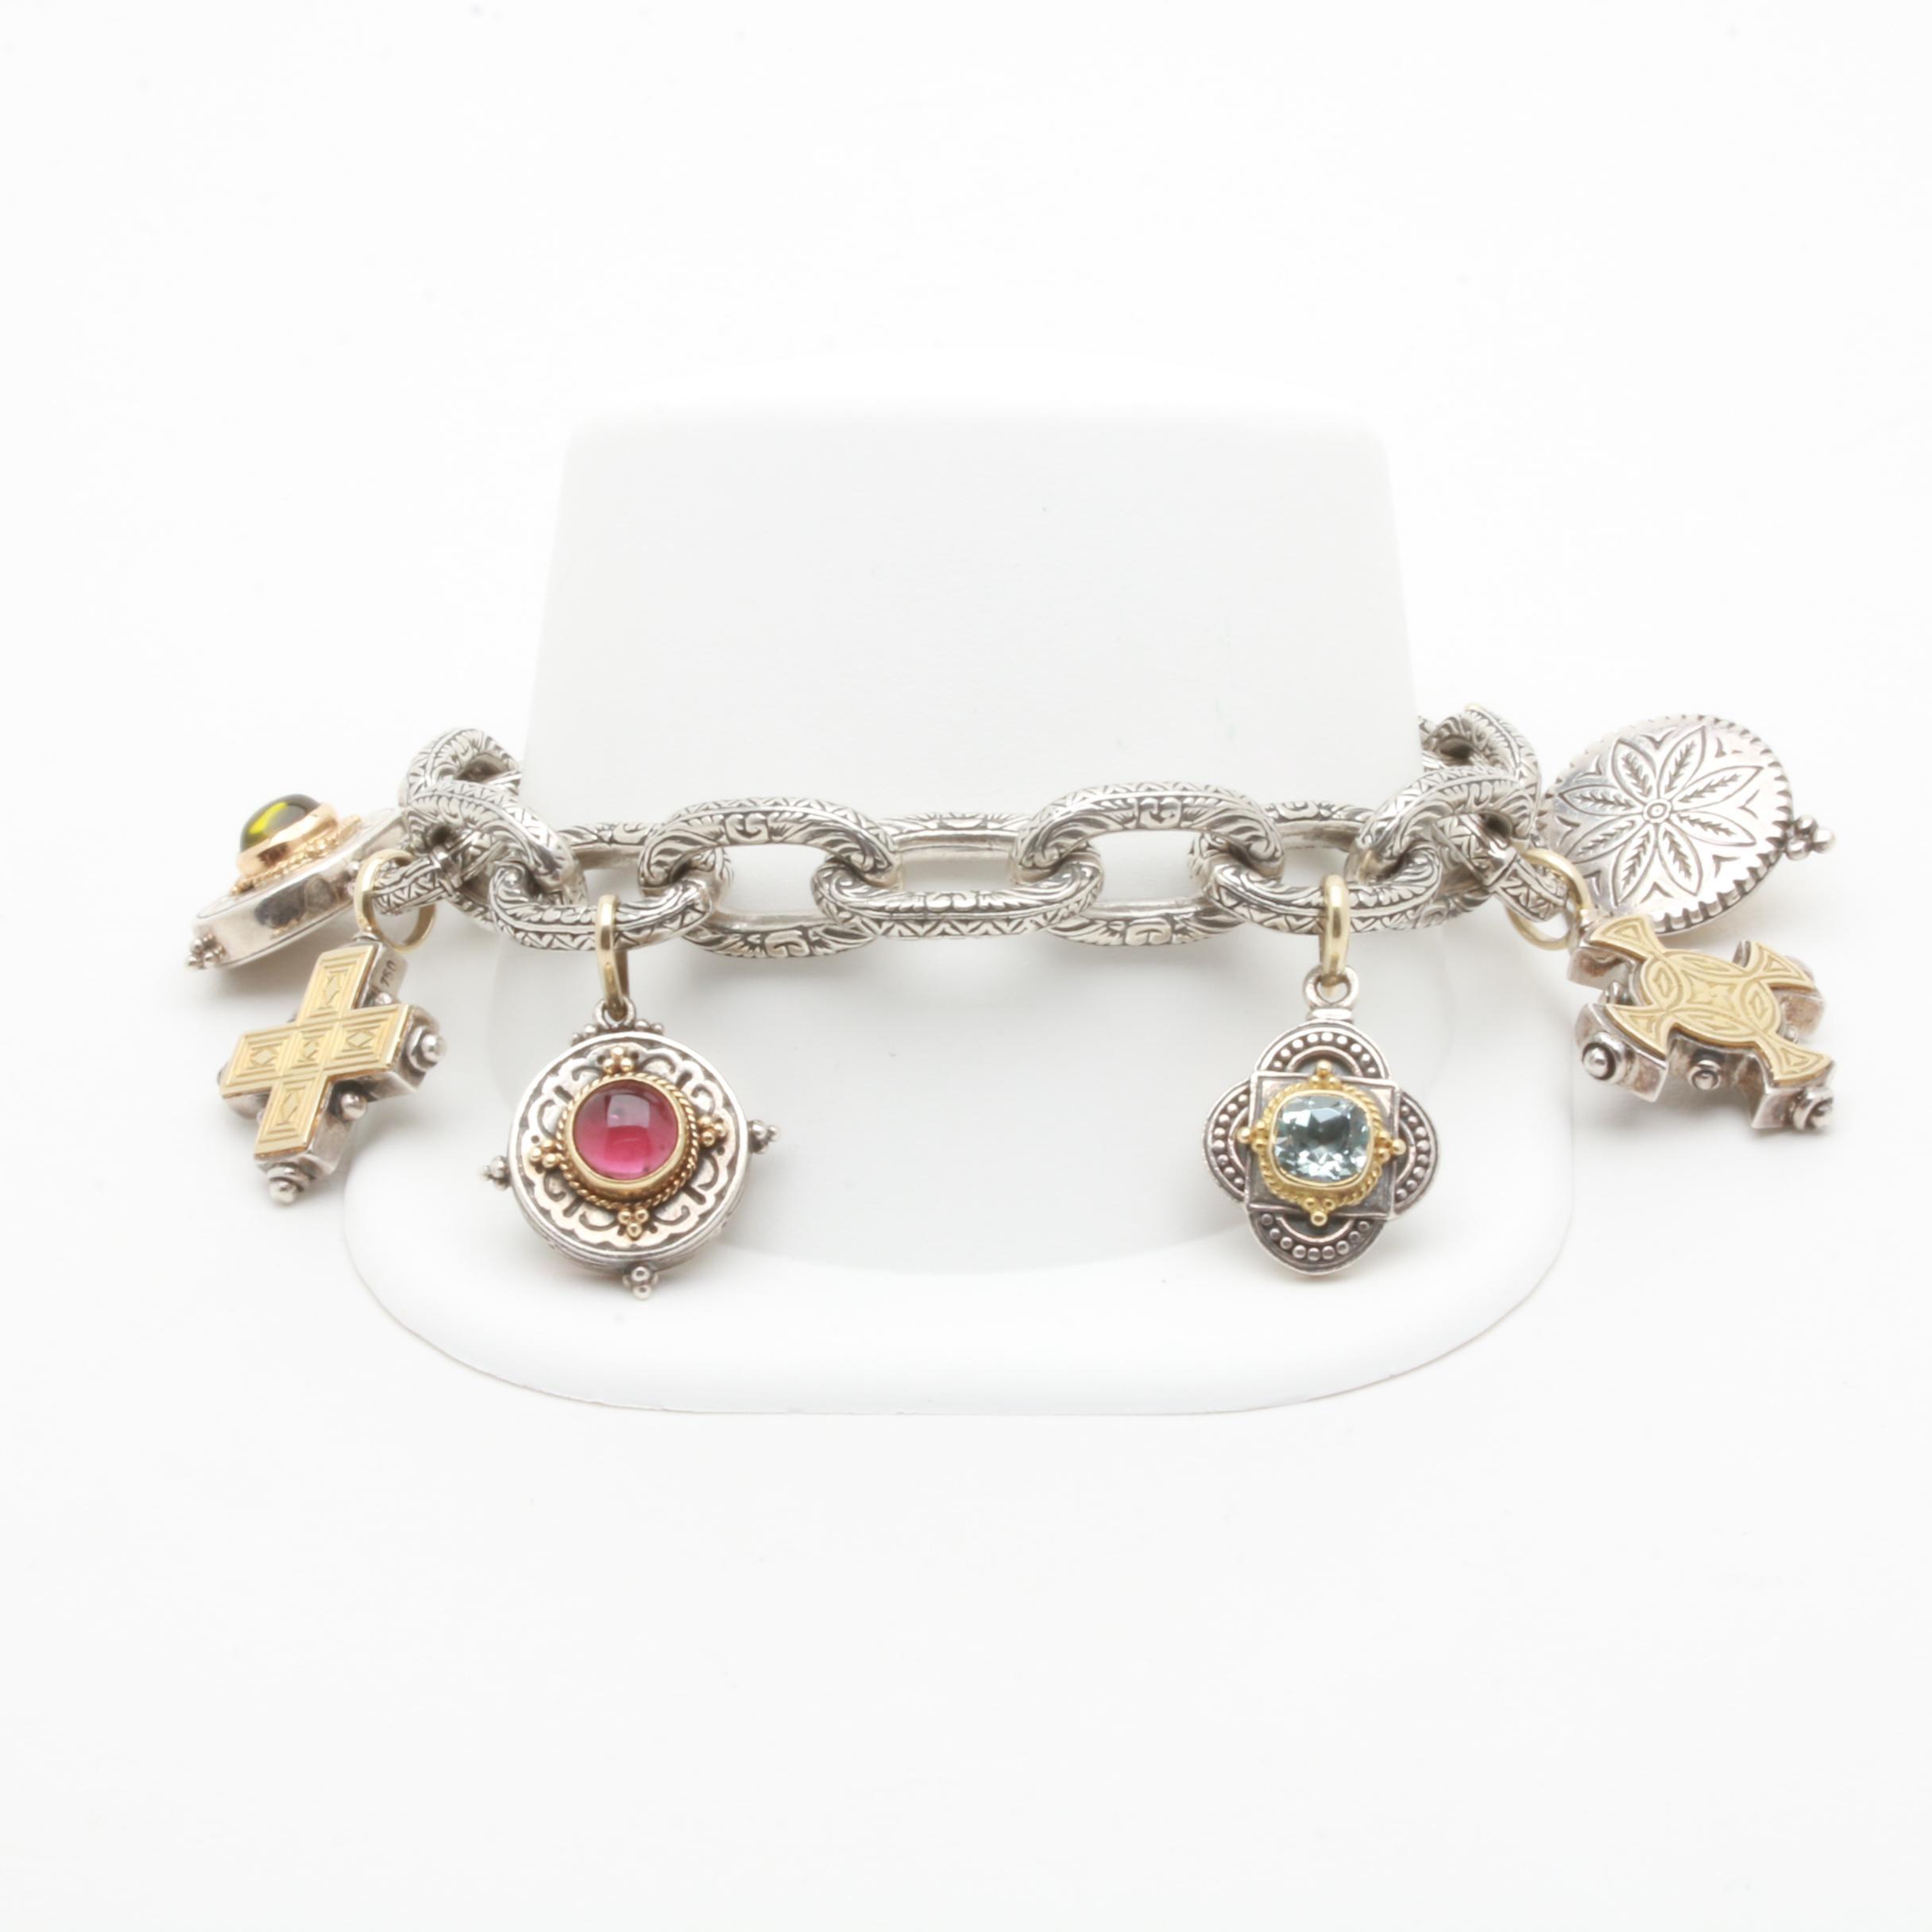 Konstantino Sterling Silver 14K Gold Accented Gemstone Pendant Bracelet